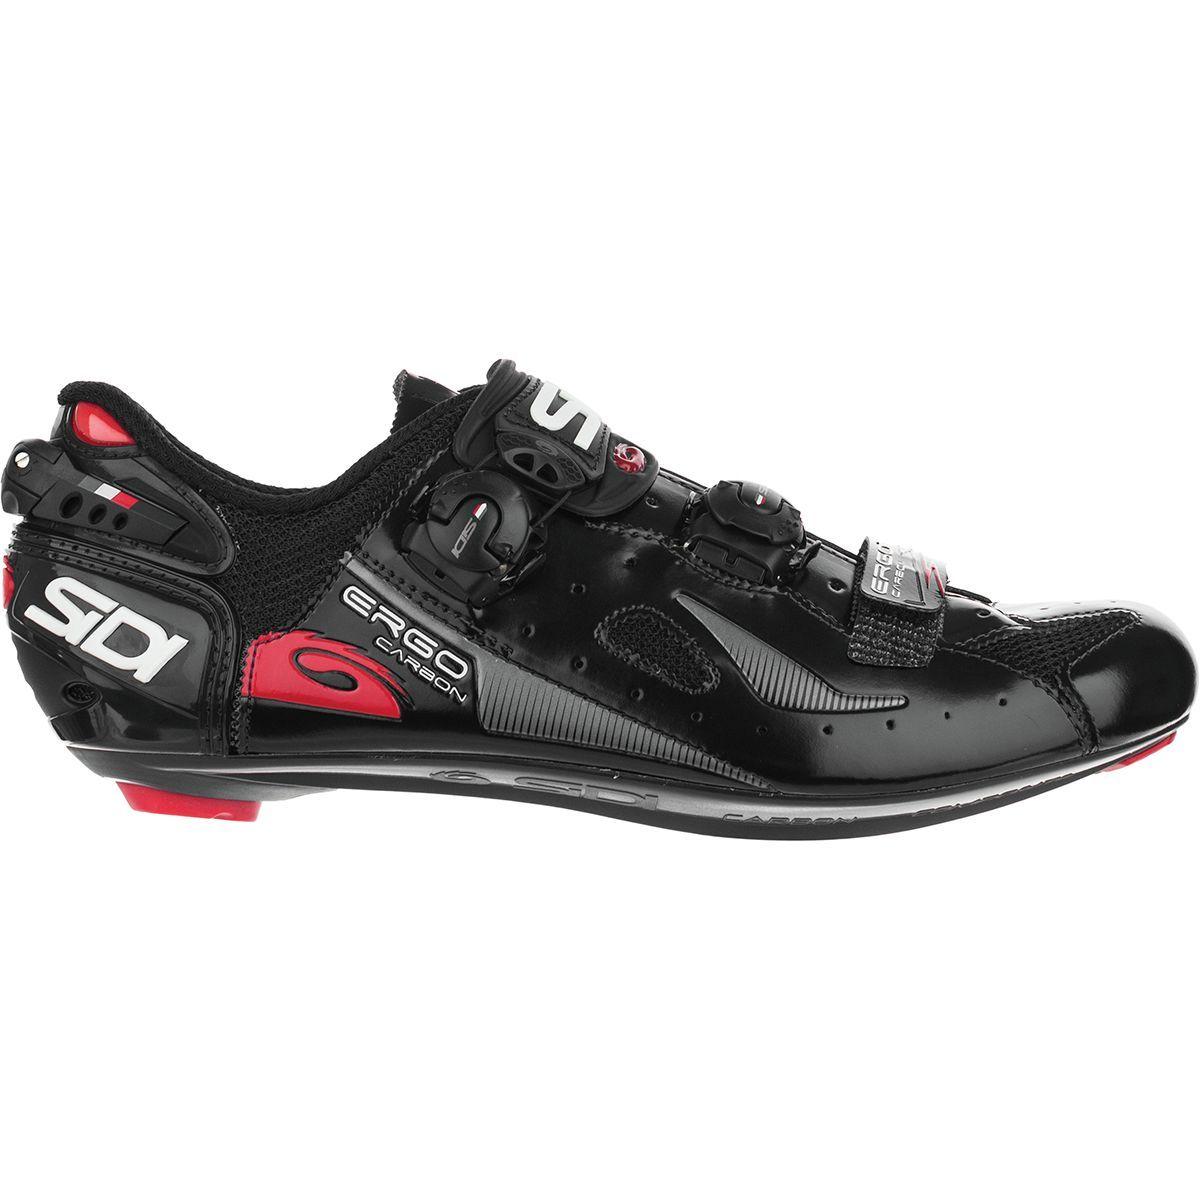 Sidi Ergo 4 Carbon Cycling Shoe - Men's